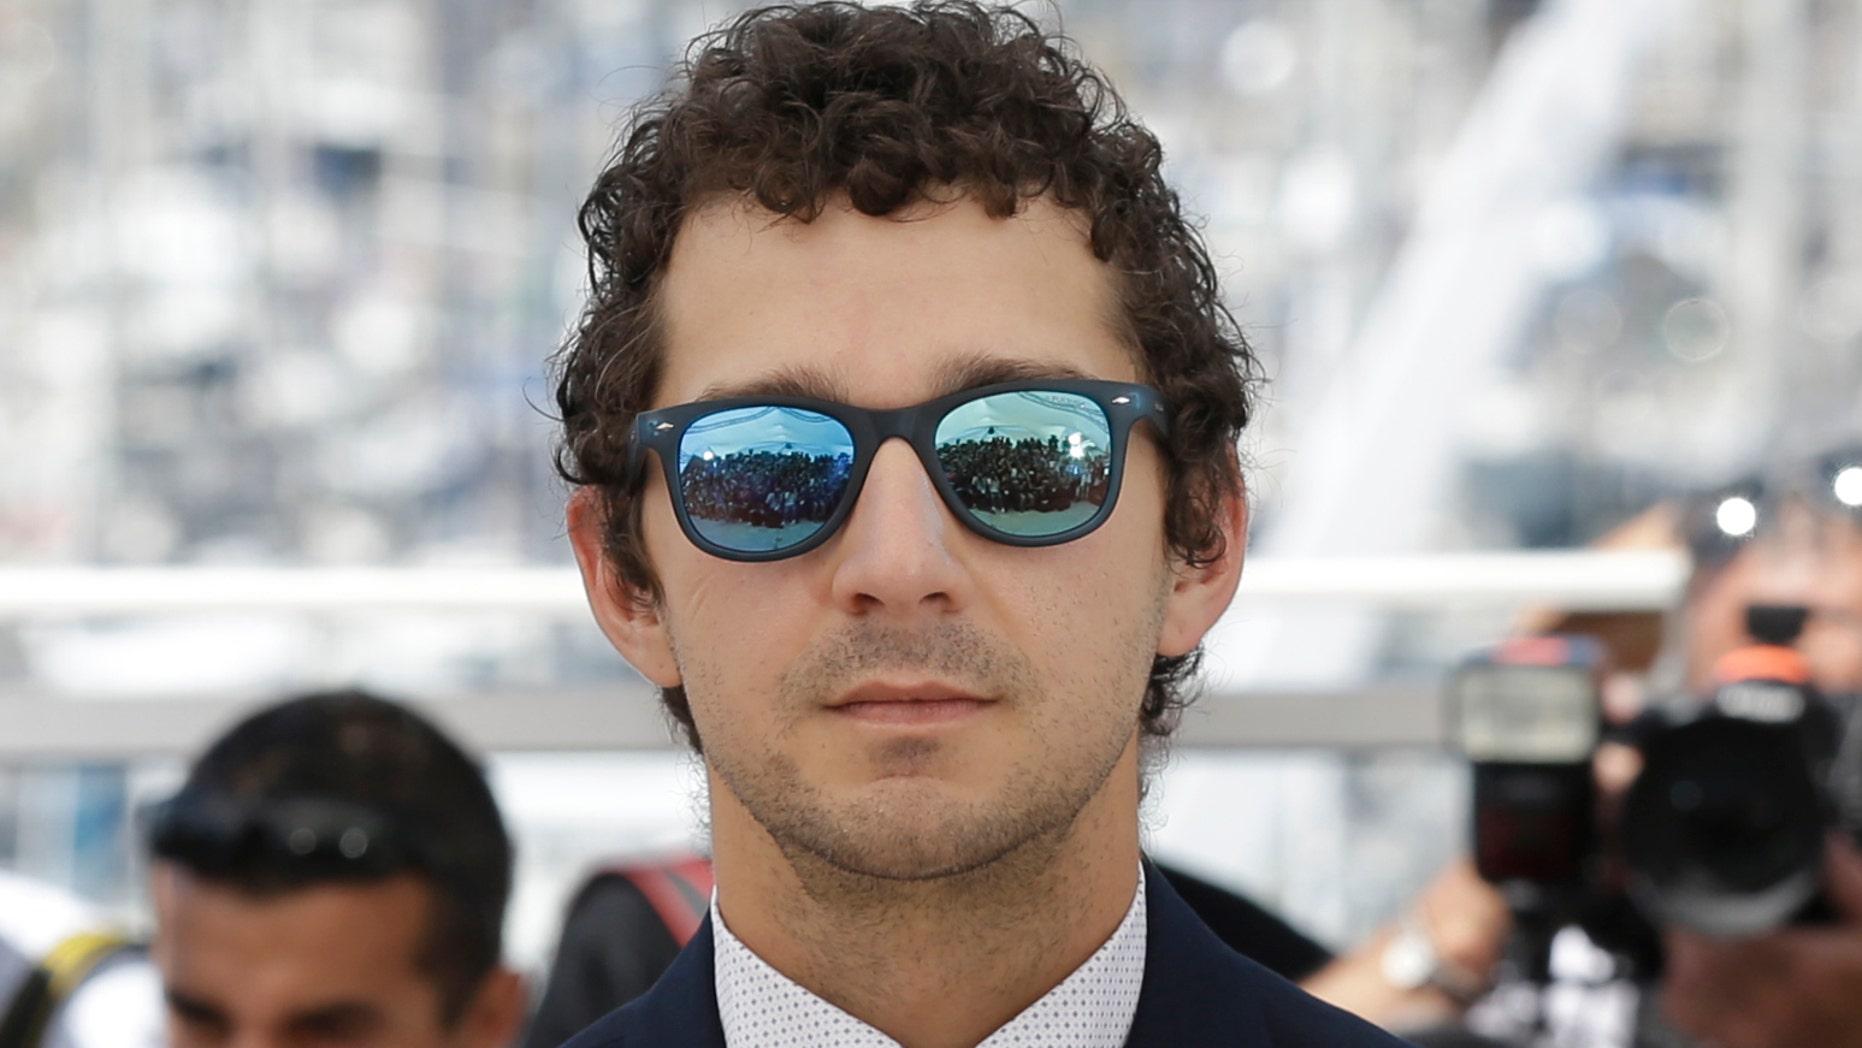 Shia Labeouf at the Cannes Film Festival